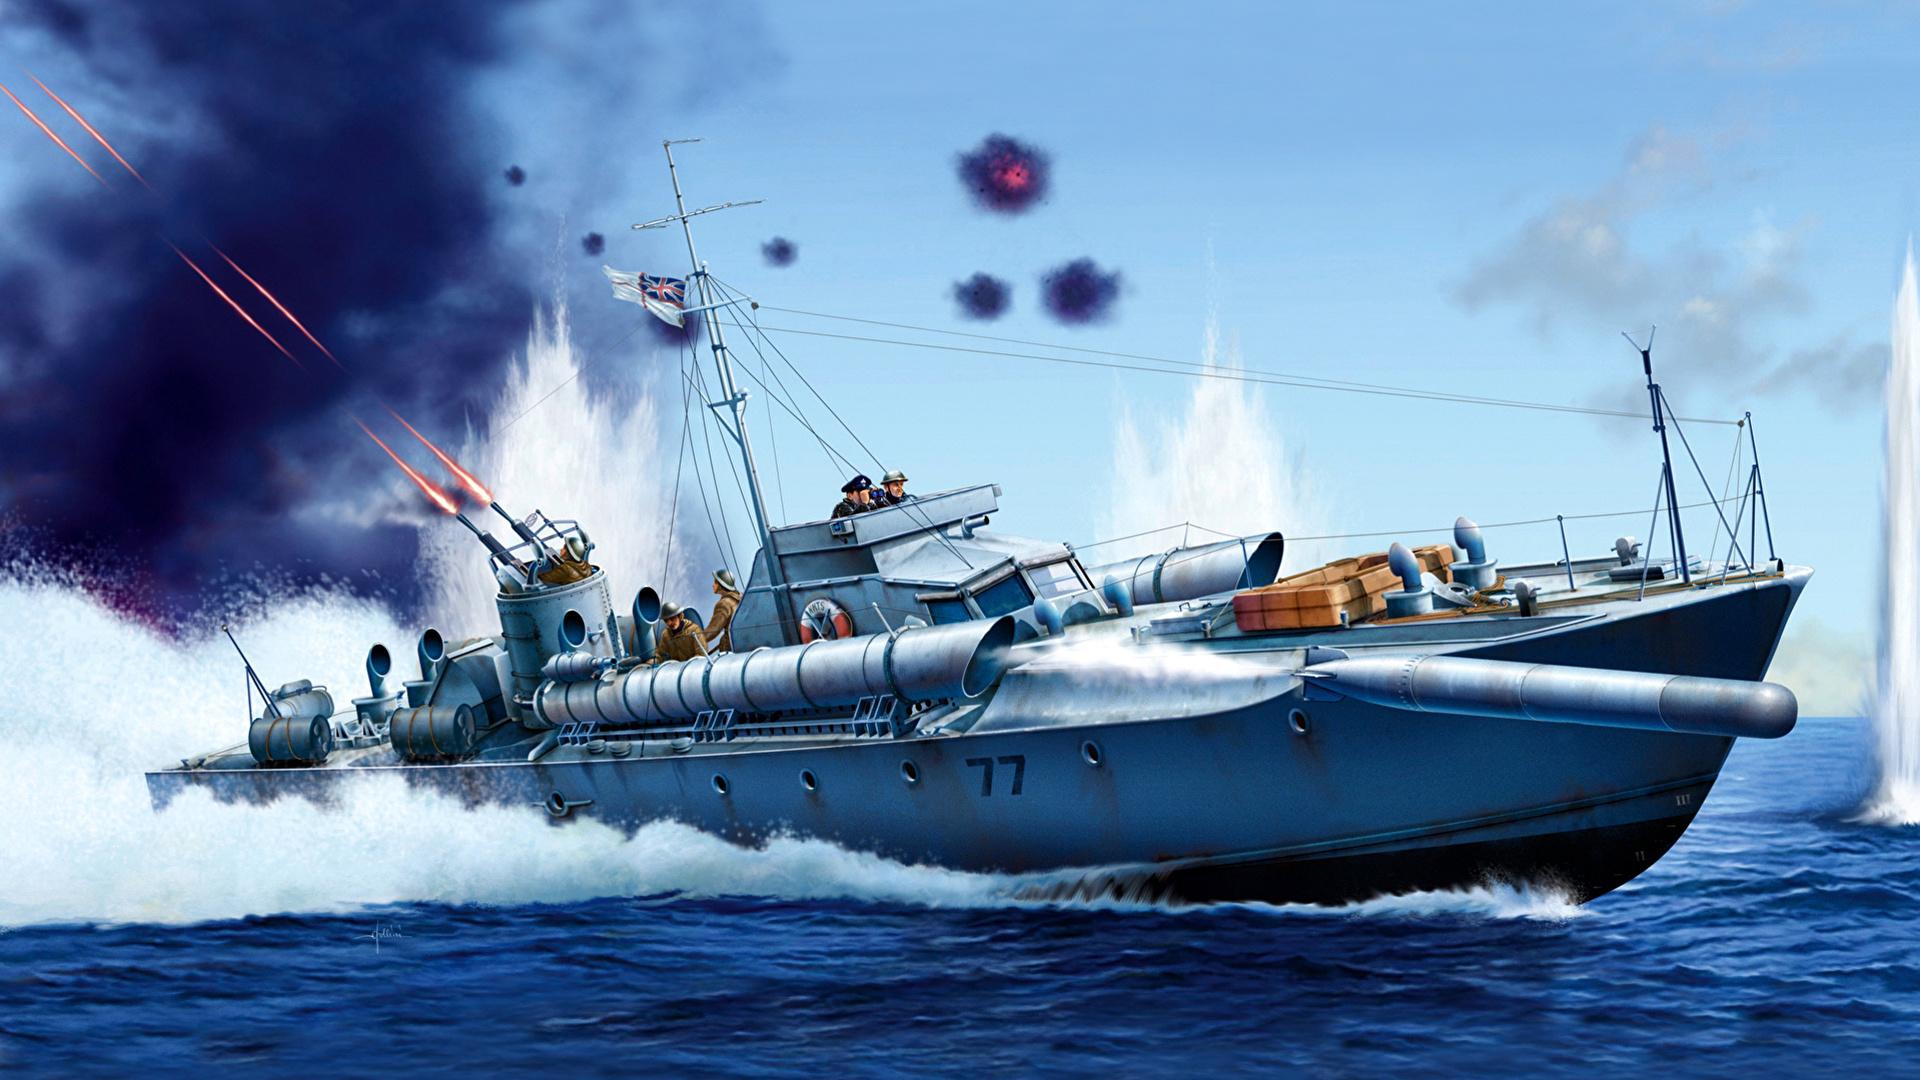 Fondos De Pantalla 1920x1080 Dibujado Lancha Motora Torpedo